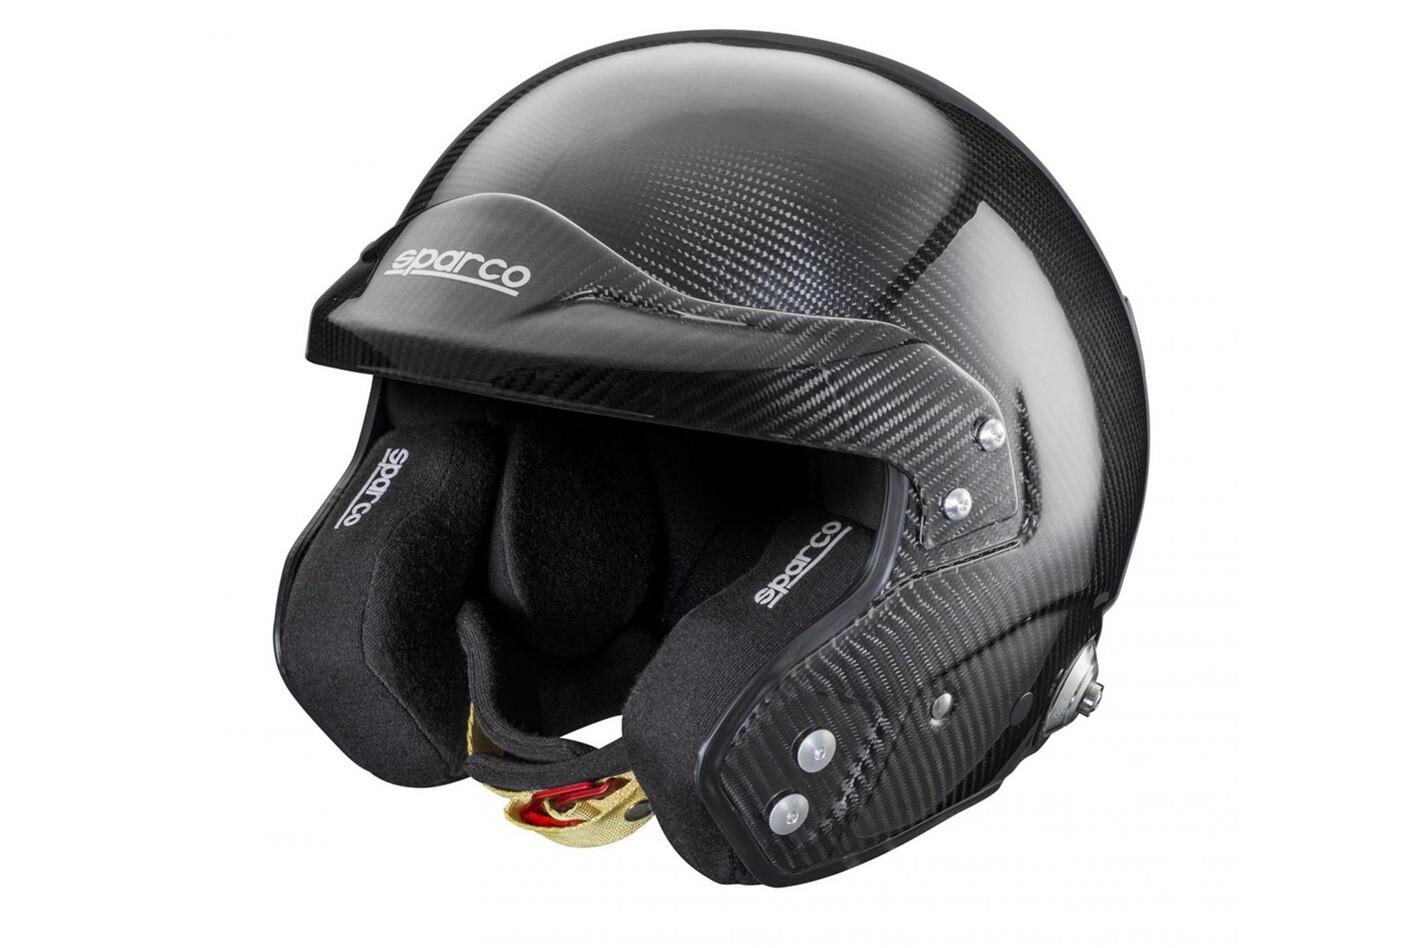 Cool Kit January Hardcover Sparco Helmet Jpg